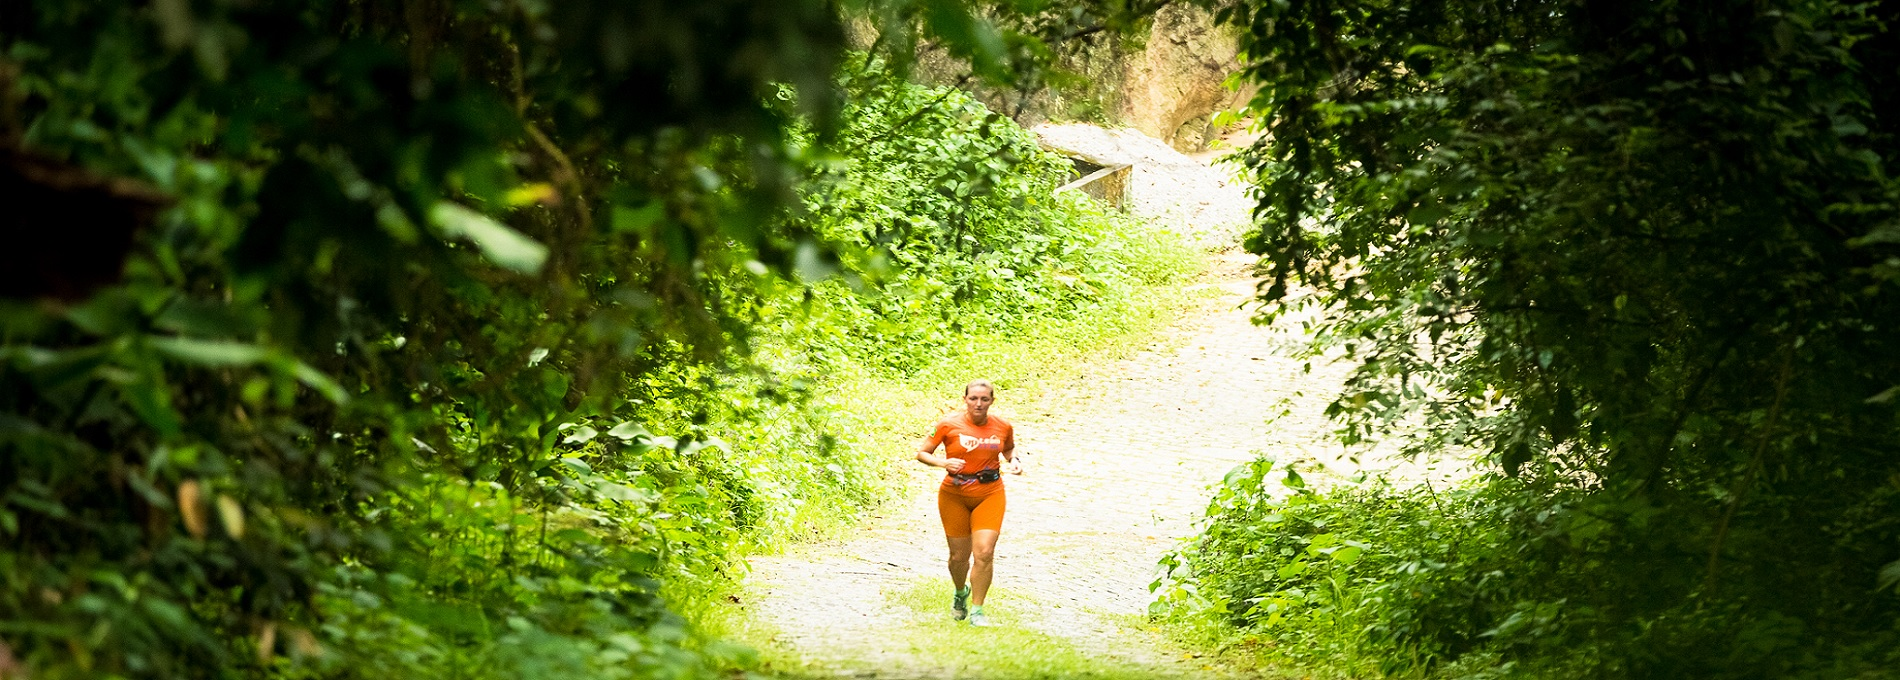 Corrida na montanha